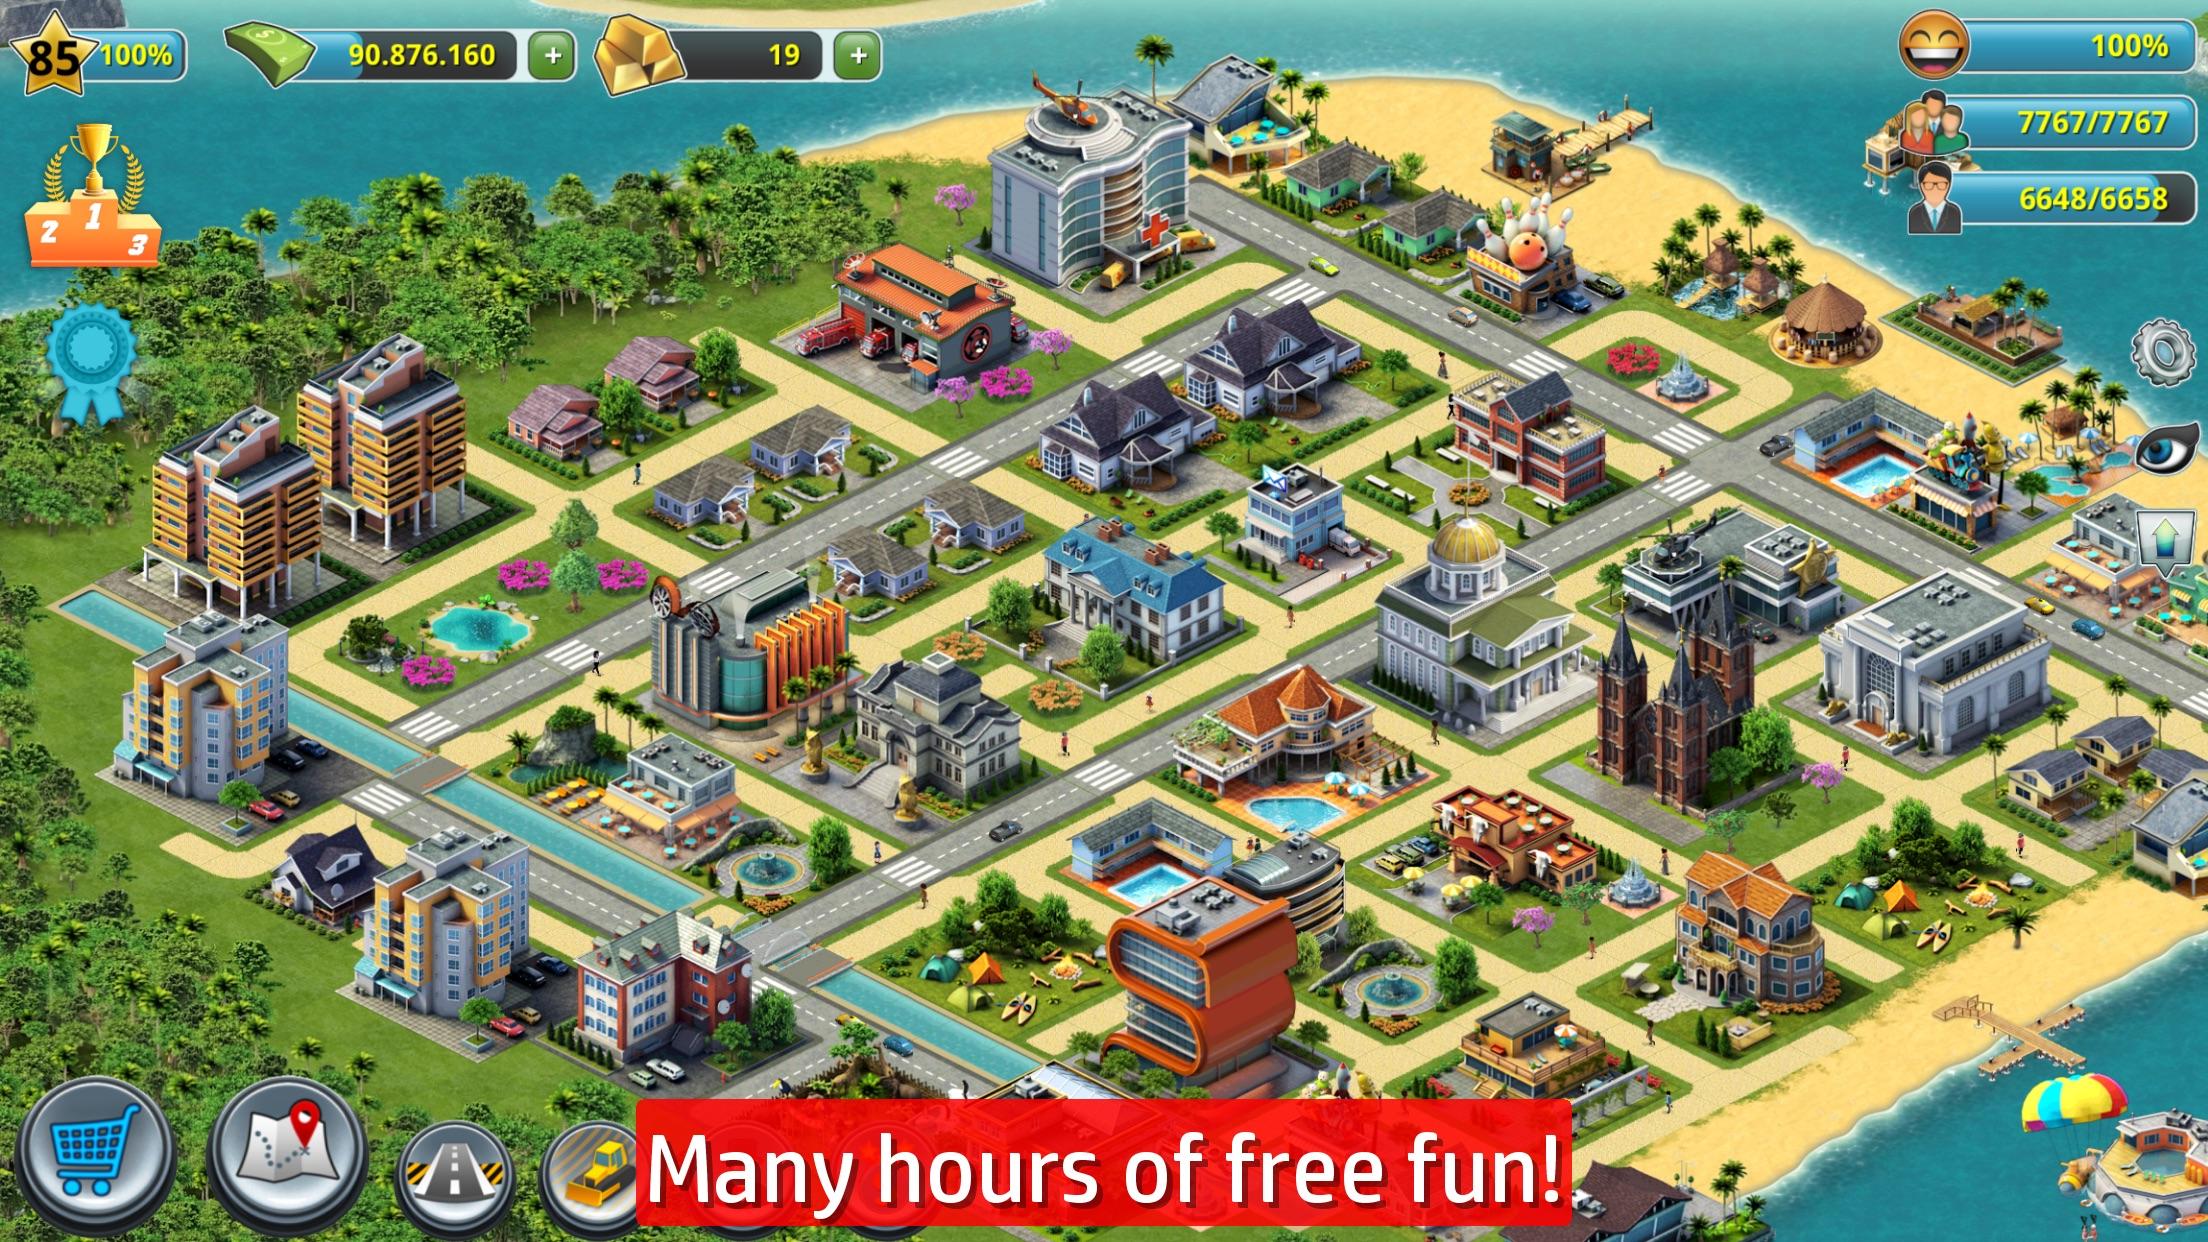 City Island 3 - Building Sim Village to Megapolis Screenshot